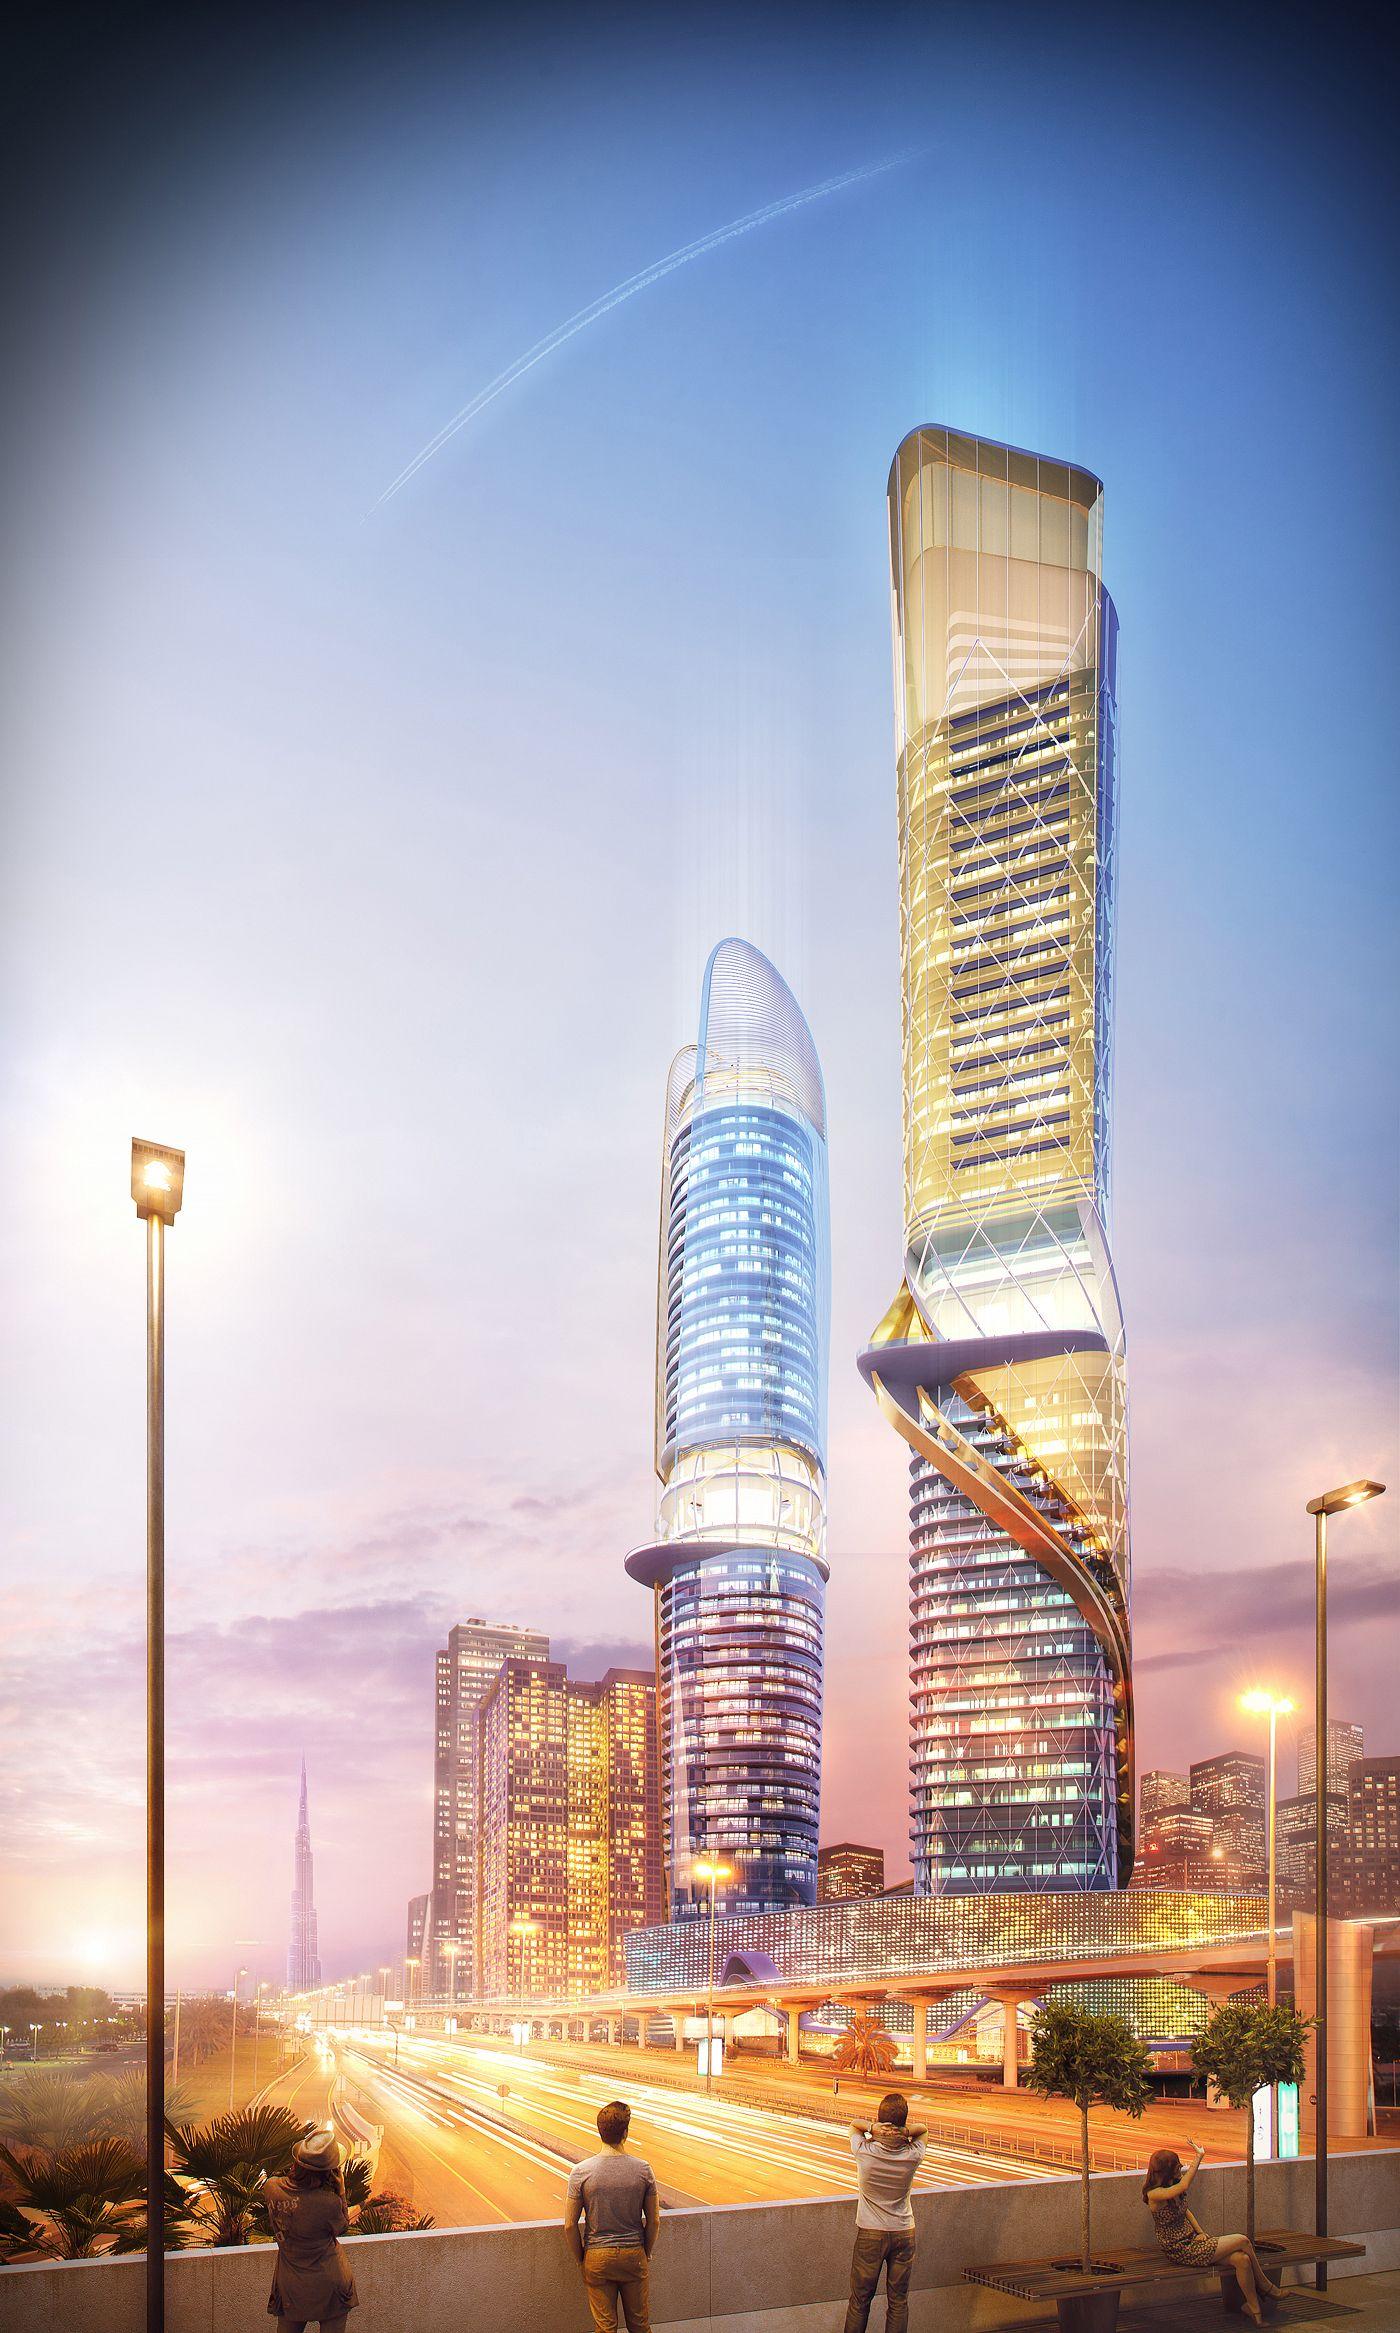 Rosemont Hotel and Serviced Apartments   ZAS Architects #Archviz by A+ studio   Milan Stevanovic Sheikh Zayed Road, #Dubai, #UAE